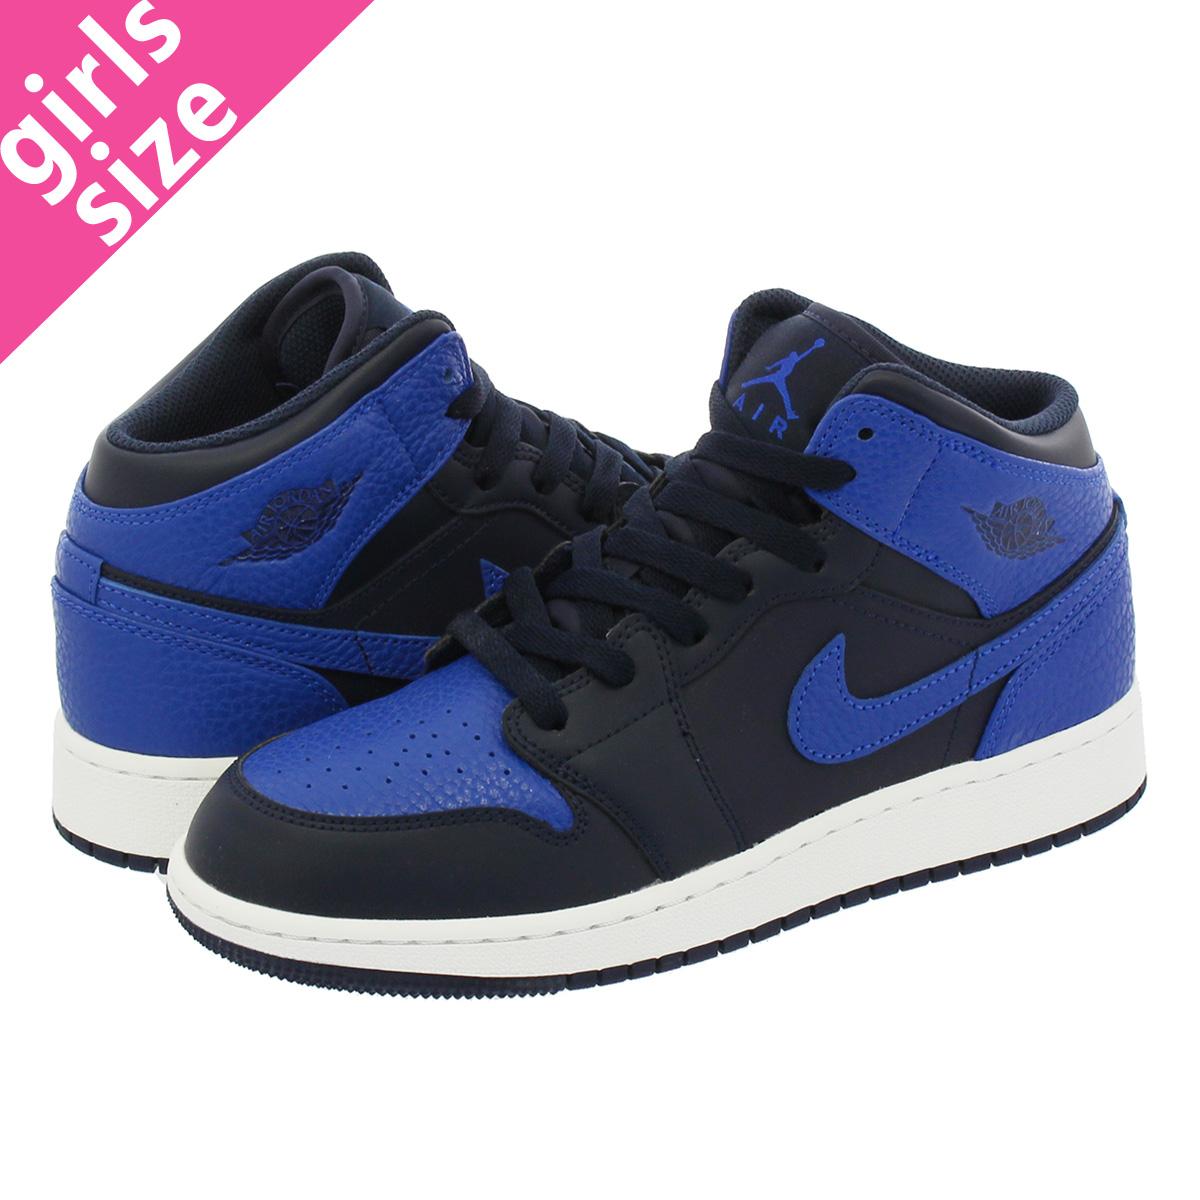 2b9f96cf33ee NIKE AIR JORDAN 1 MID BG Nike Air Jordan 1 mid BG OBSIDIAN GAME ROYAL SUMMIT  WHITE